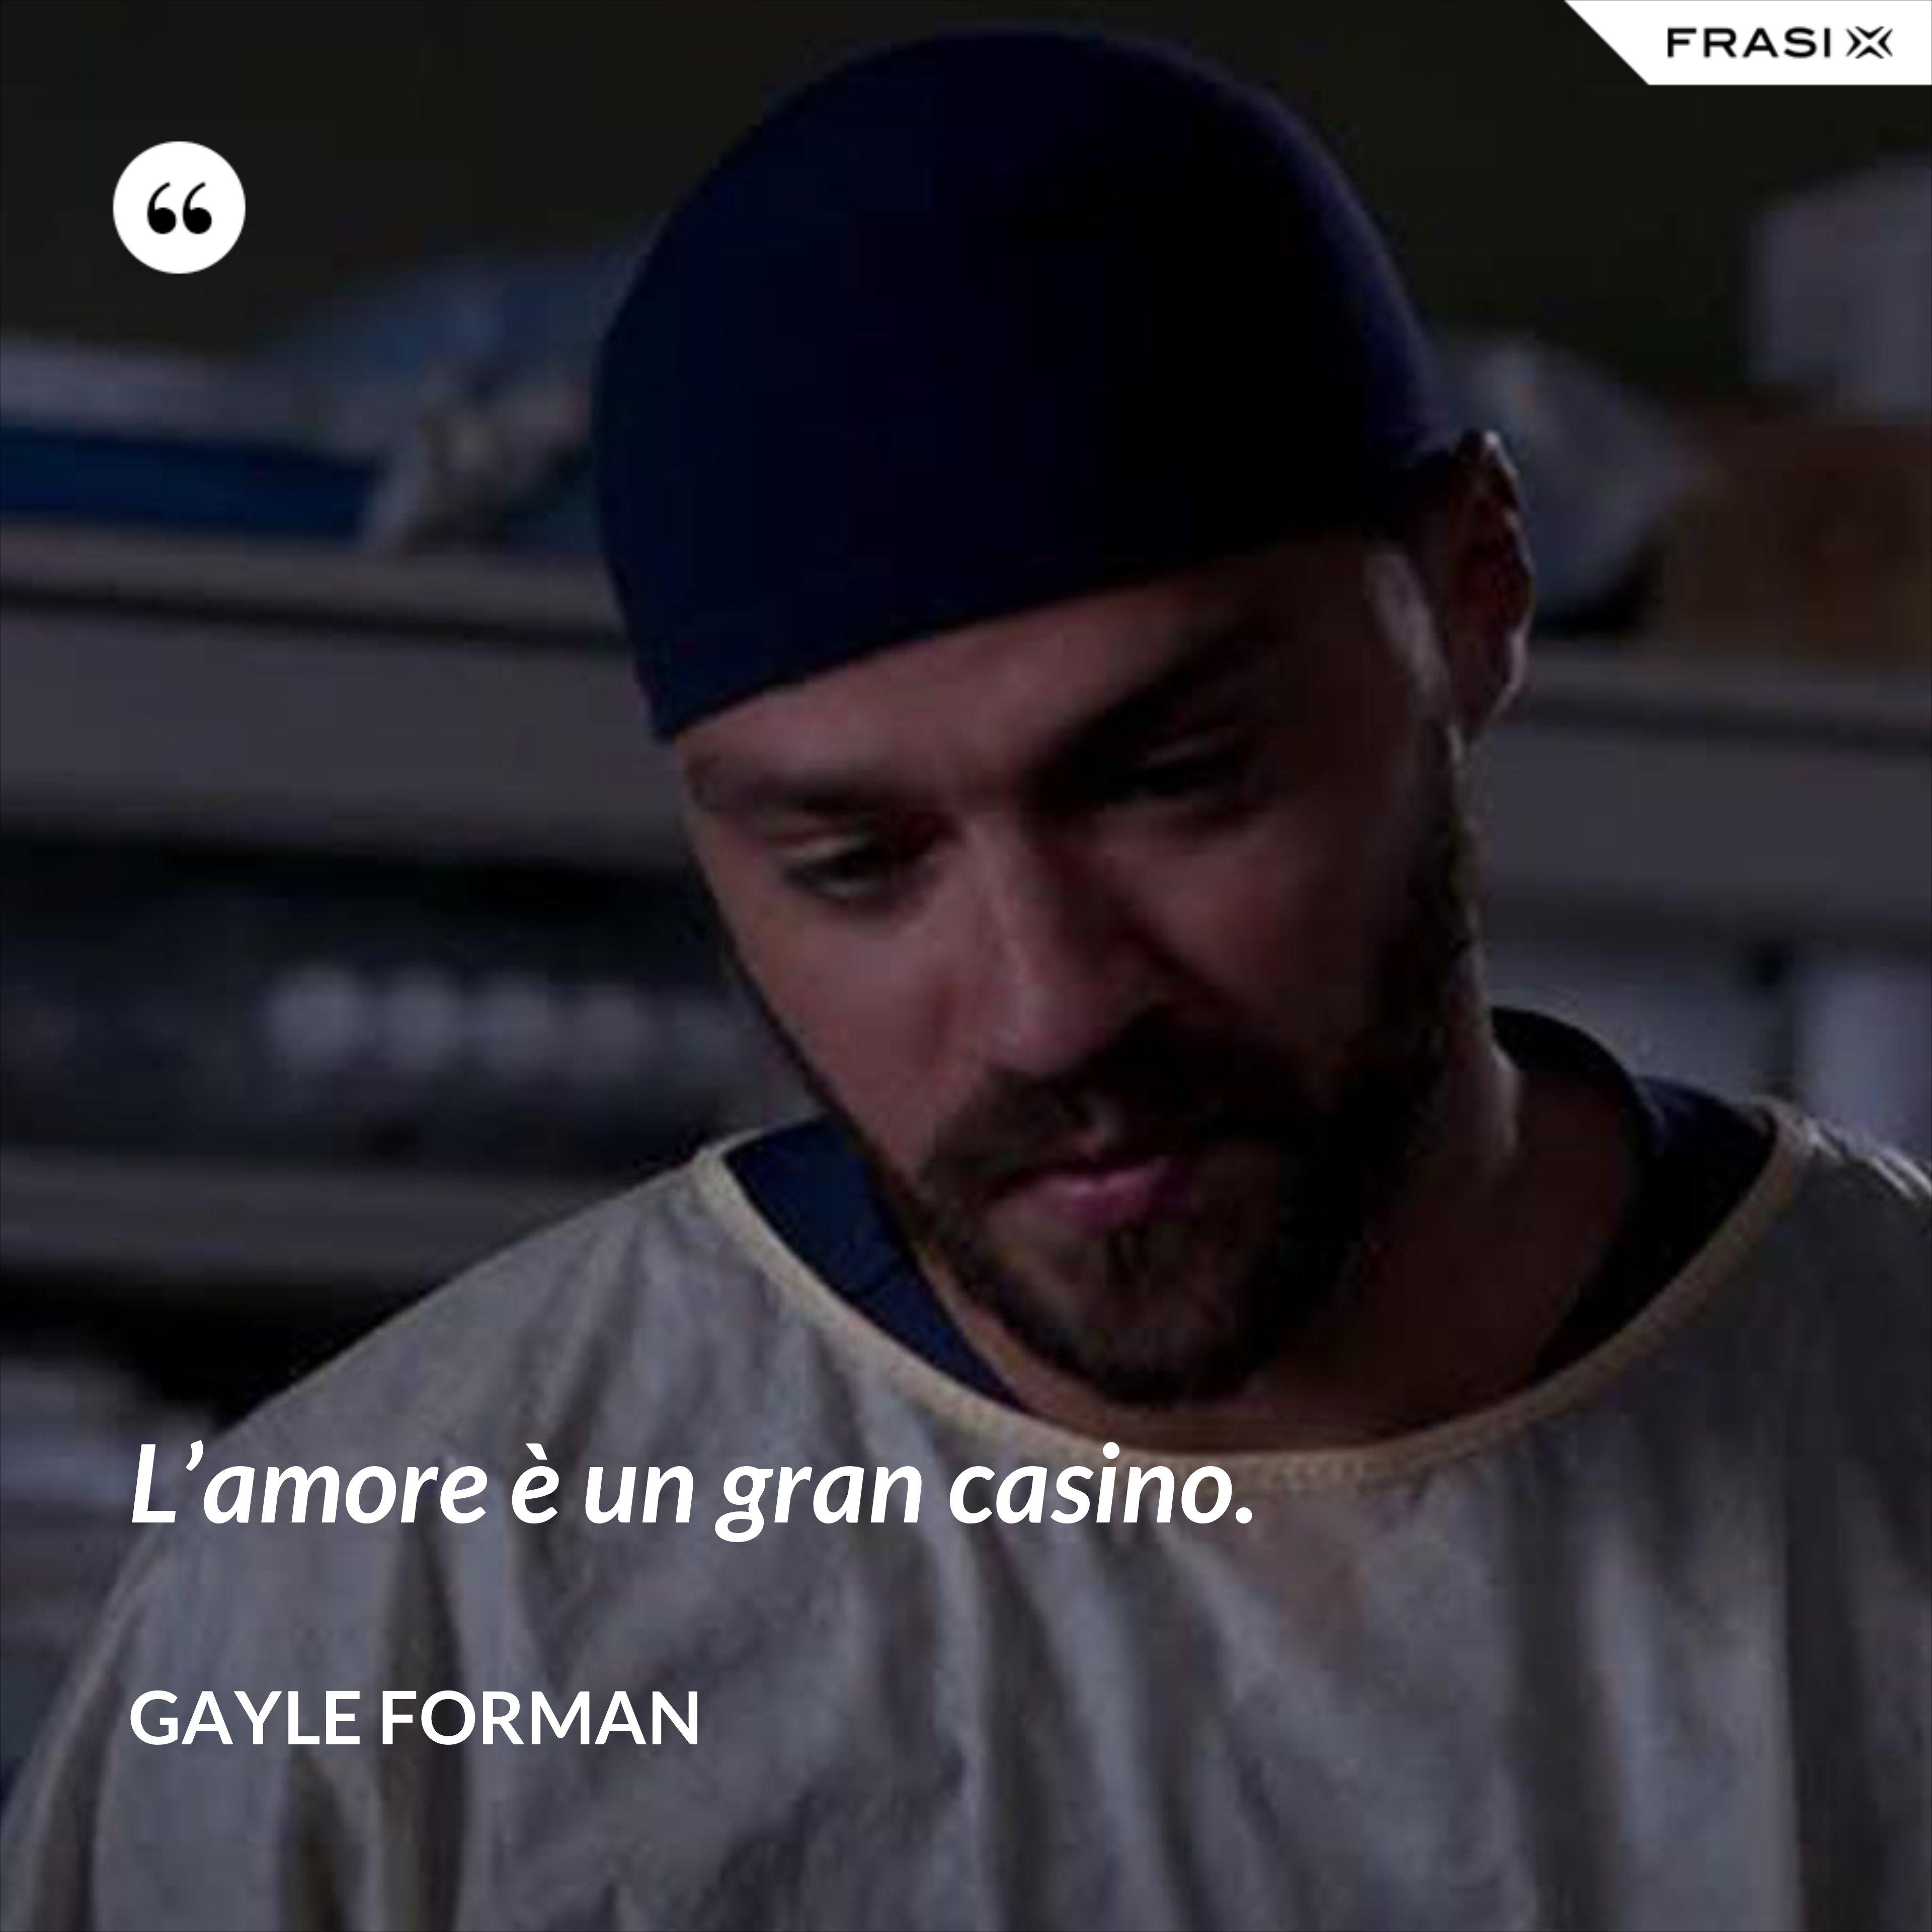 L'amore è un gran casino. - Gayle Forman